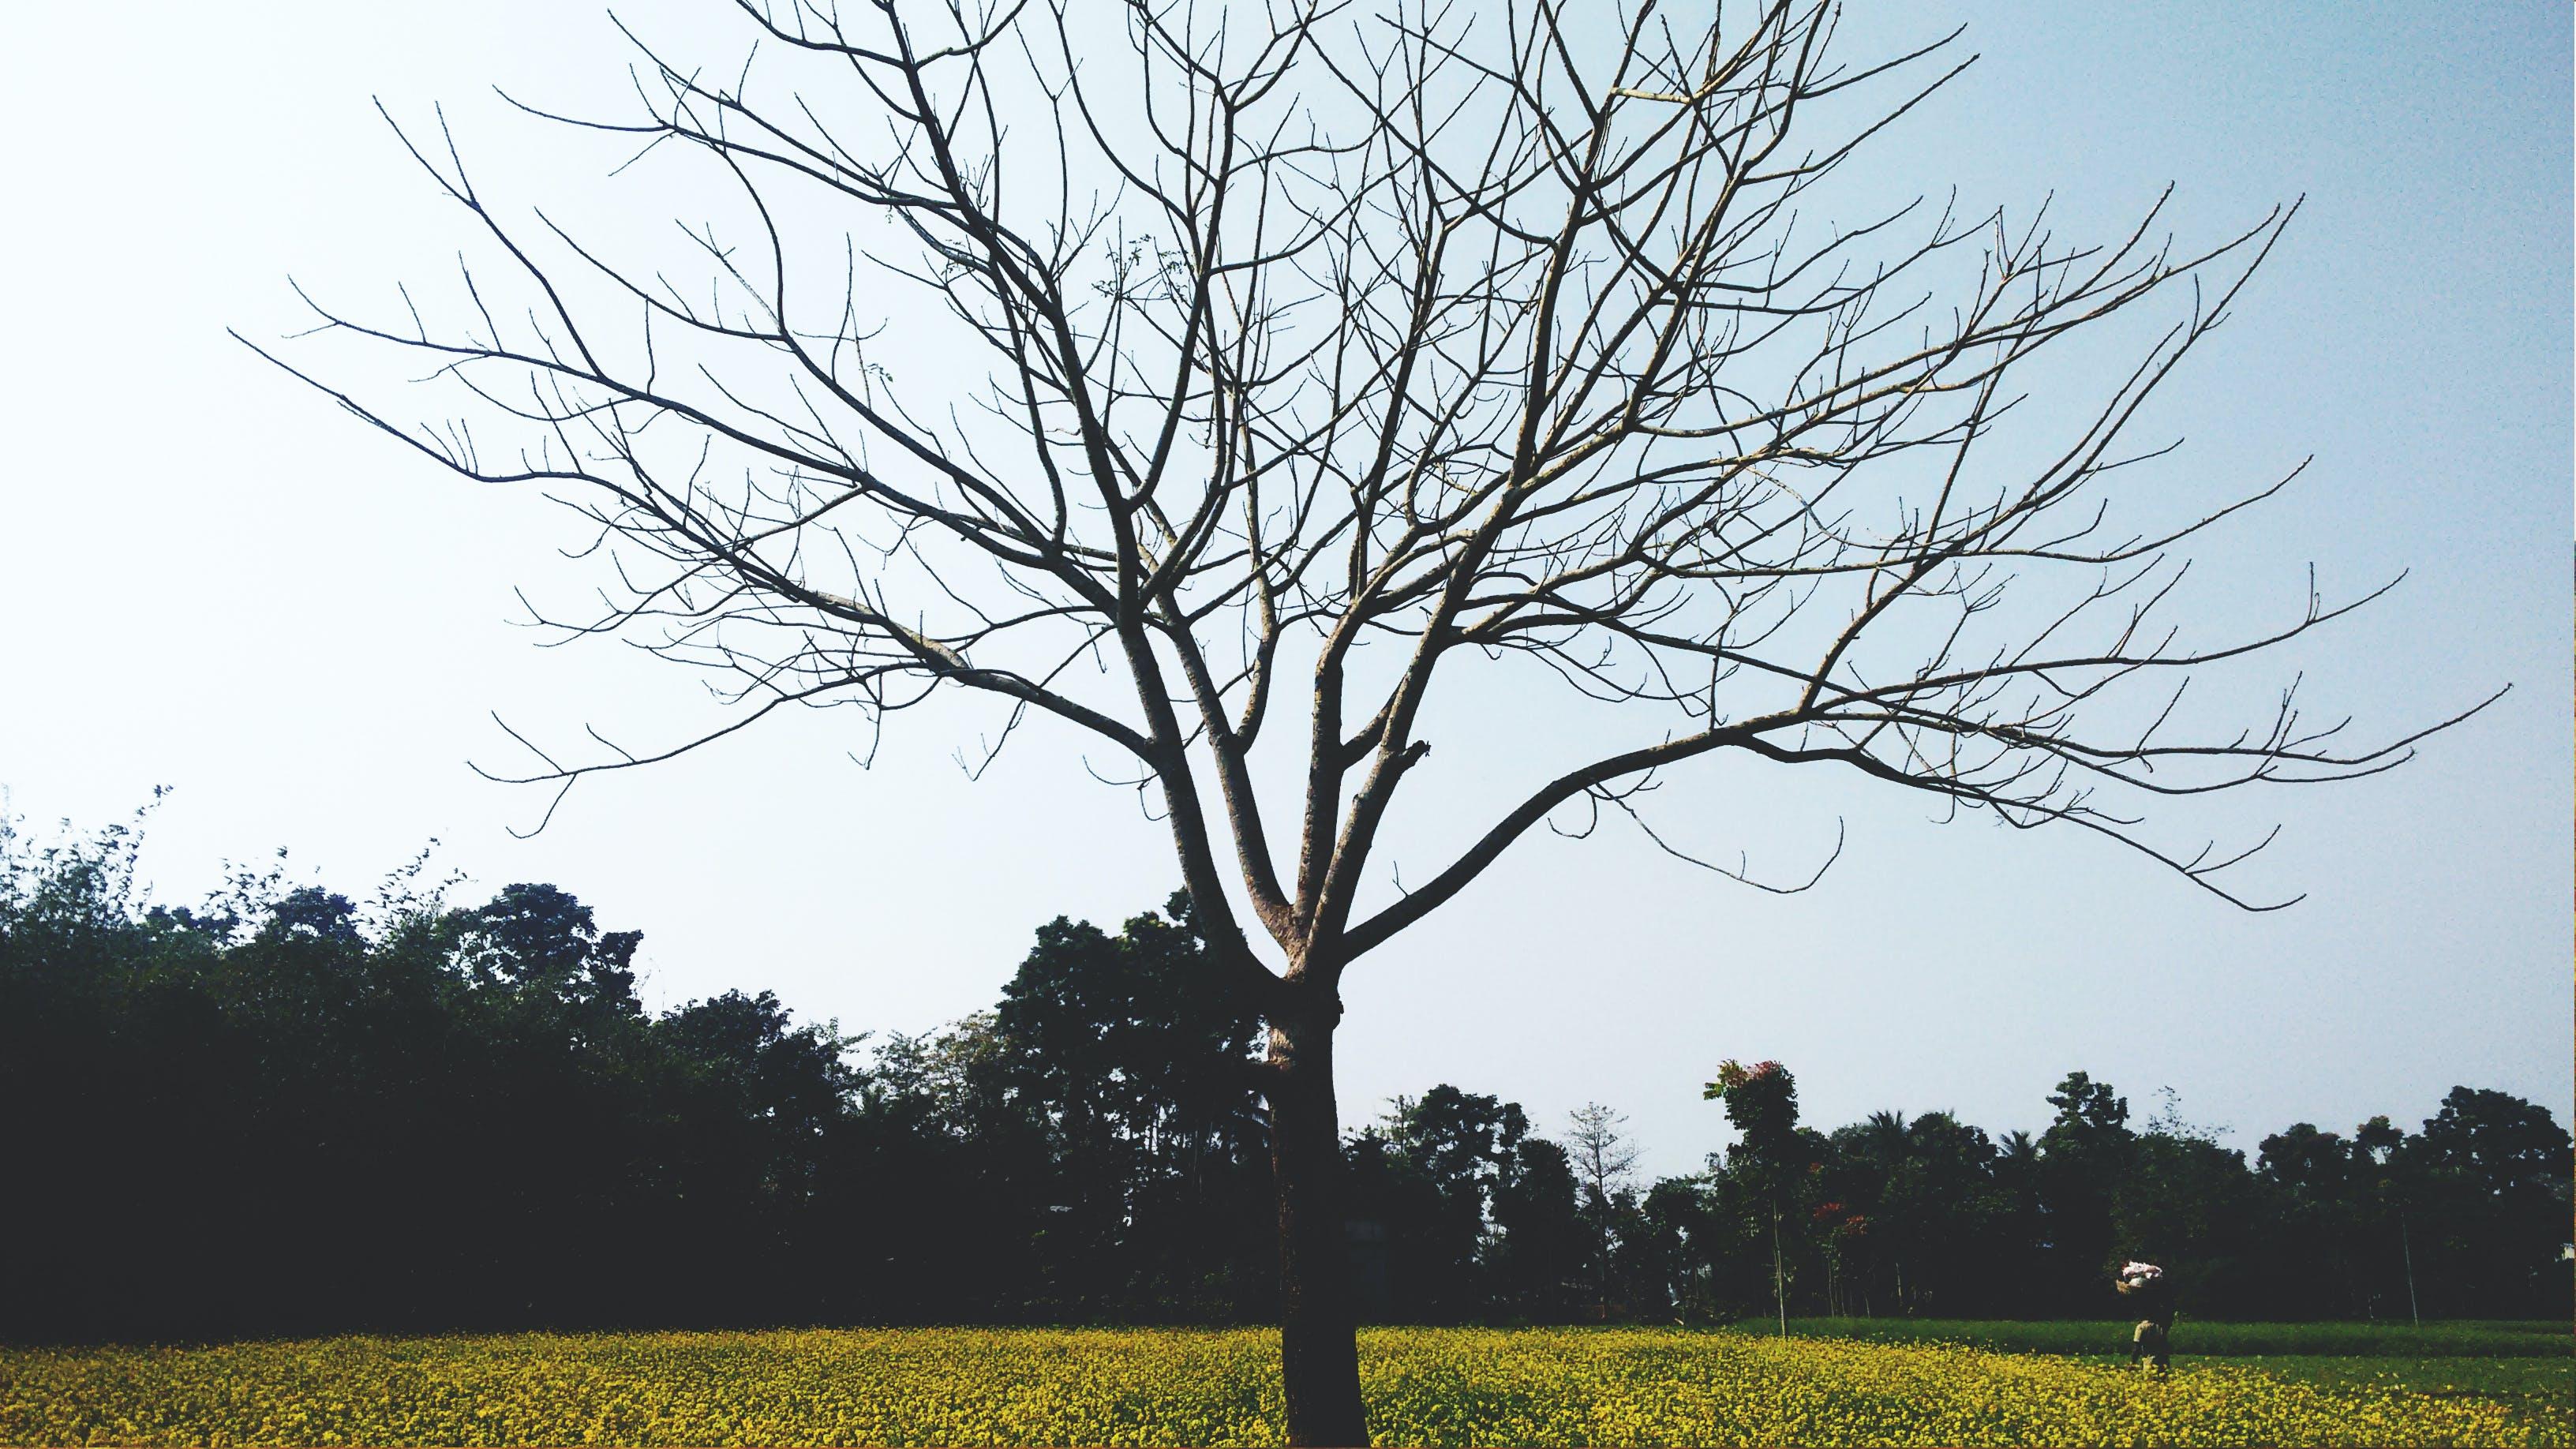 Free stock photo of background, black, blue sky, fedoragraphic